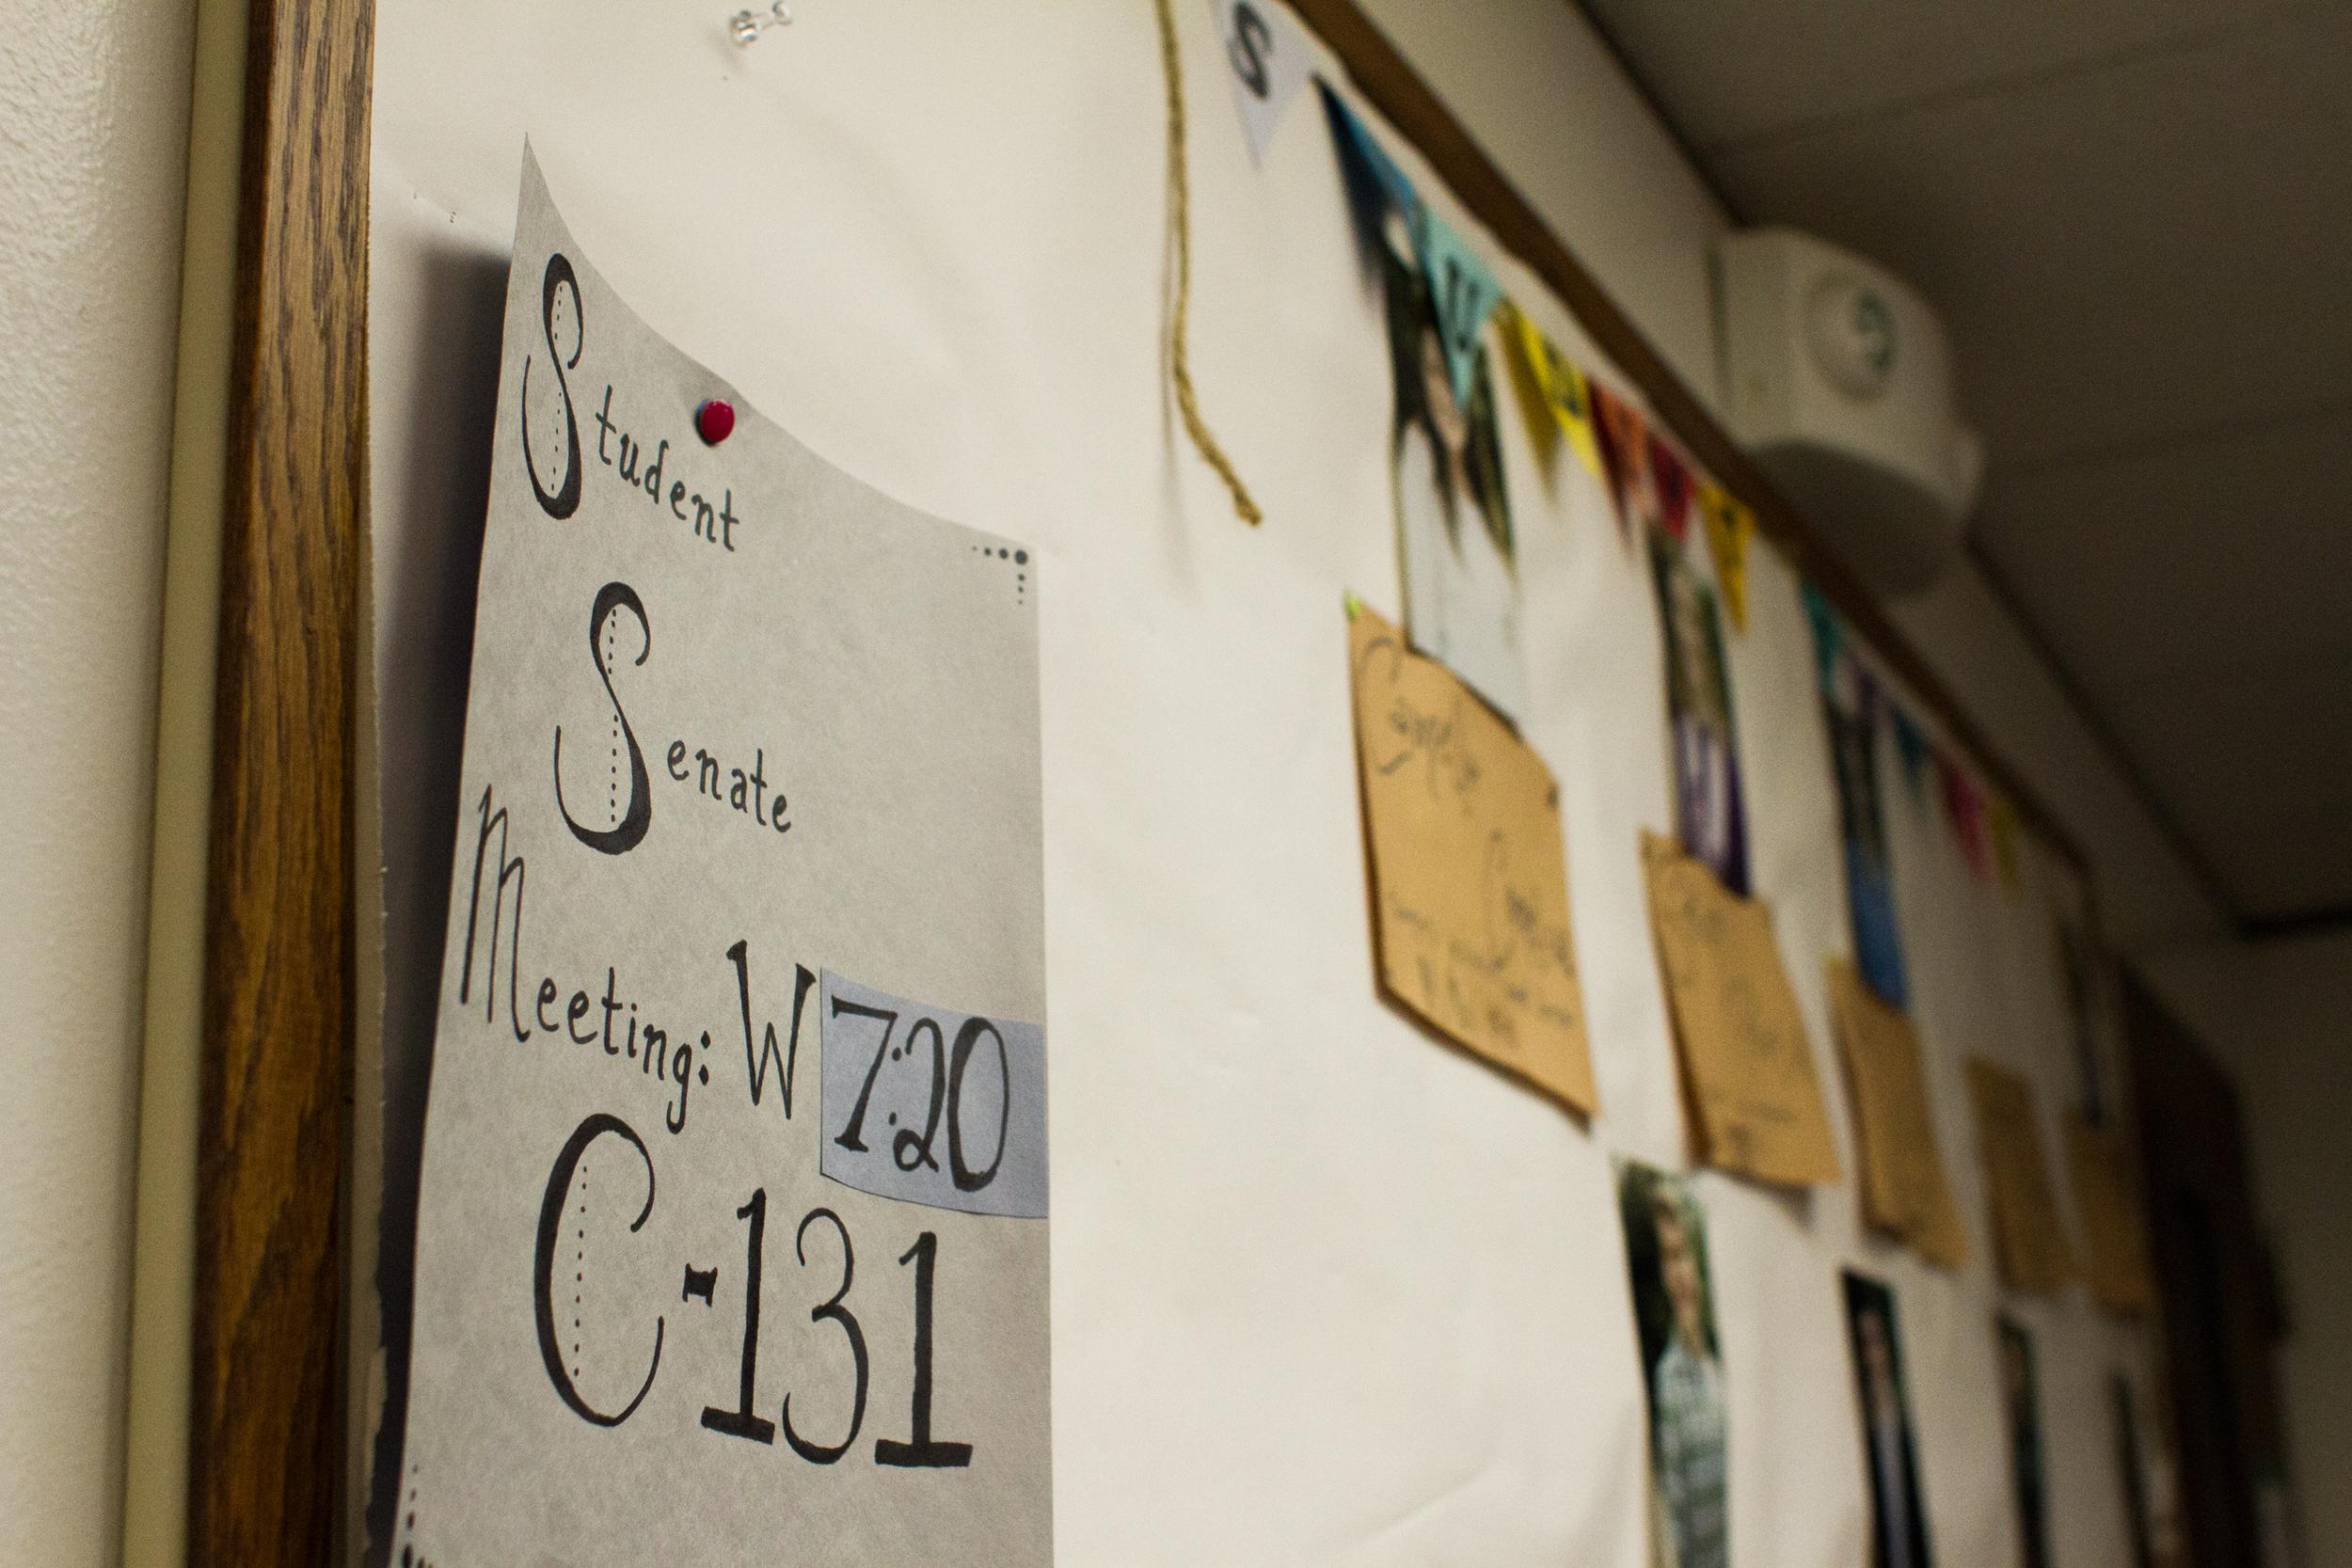 Student Senate Bulletin Board. Photo by Abby Whisler.